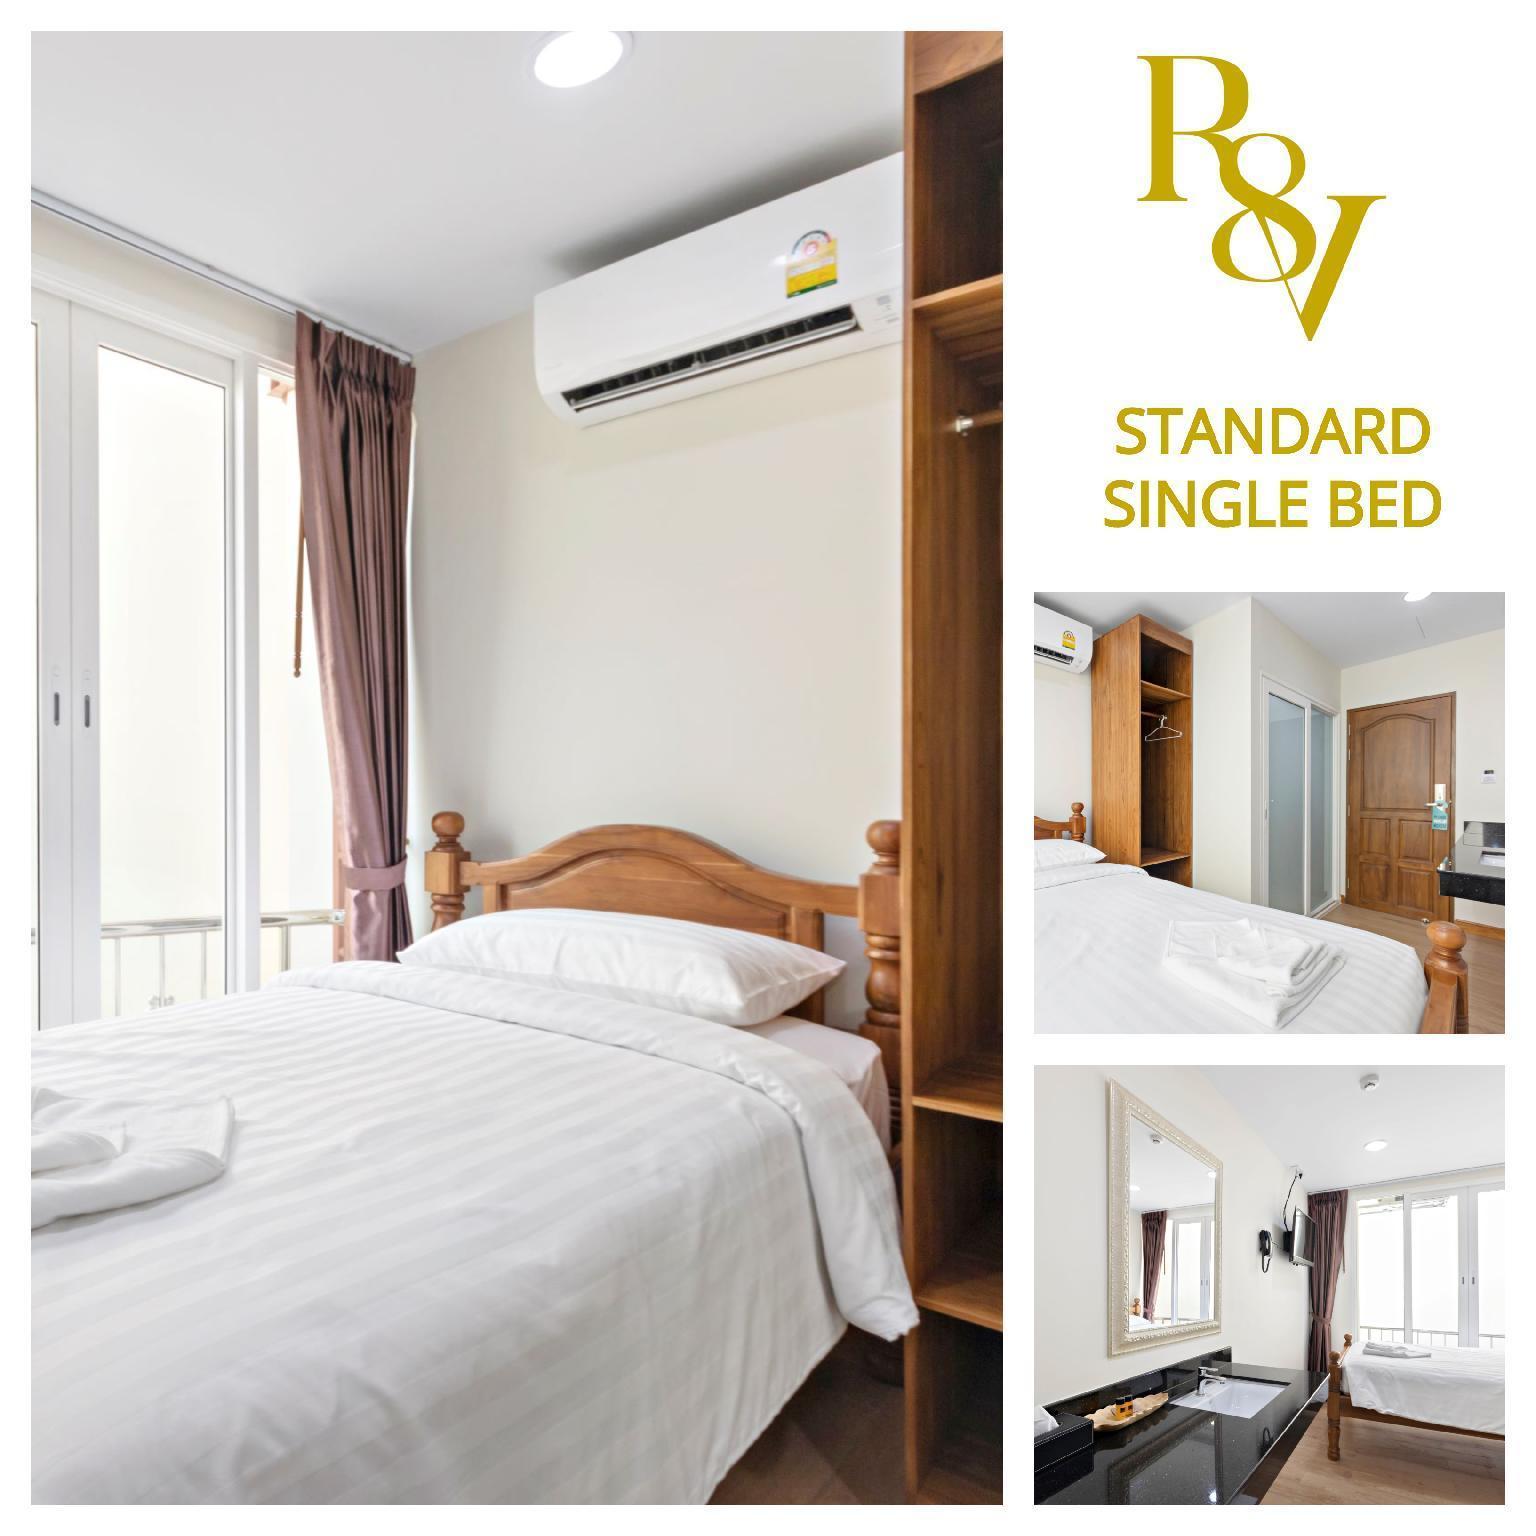 Standard Single Bed (SSB)-Royale 8 Ville อพาร์ตเมนต์ 1 ห้องนอน 1 ห้องน้ำส่วนตัว ขนาด 14 ตร.ม. – ข้าวสาร